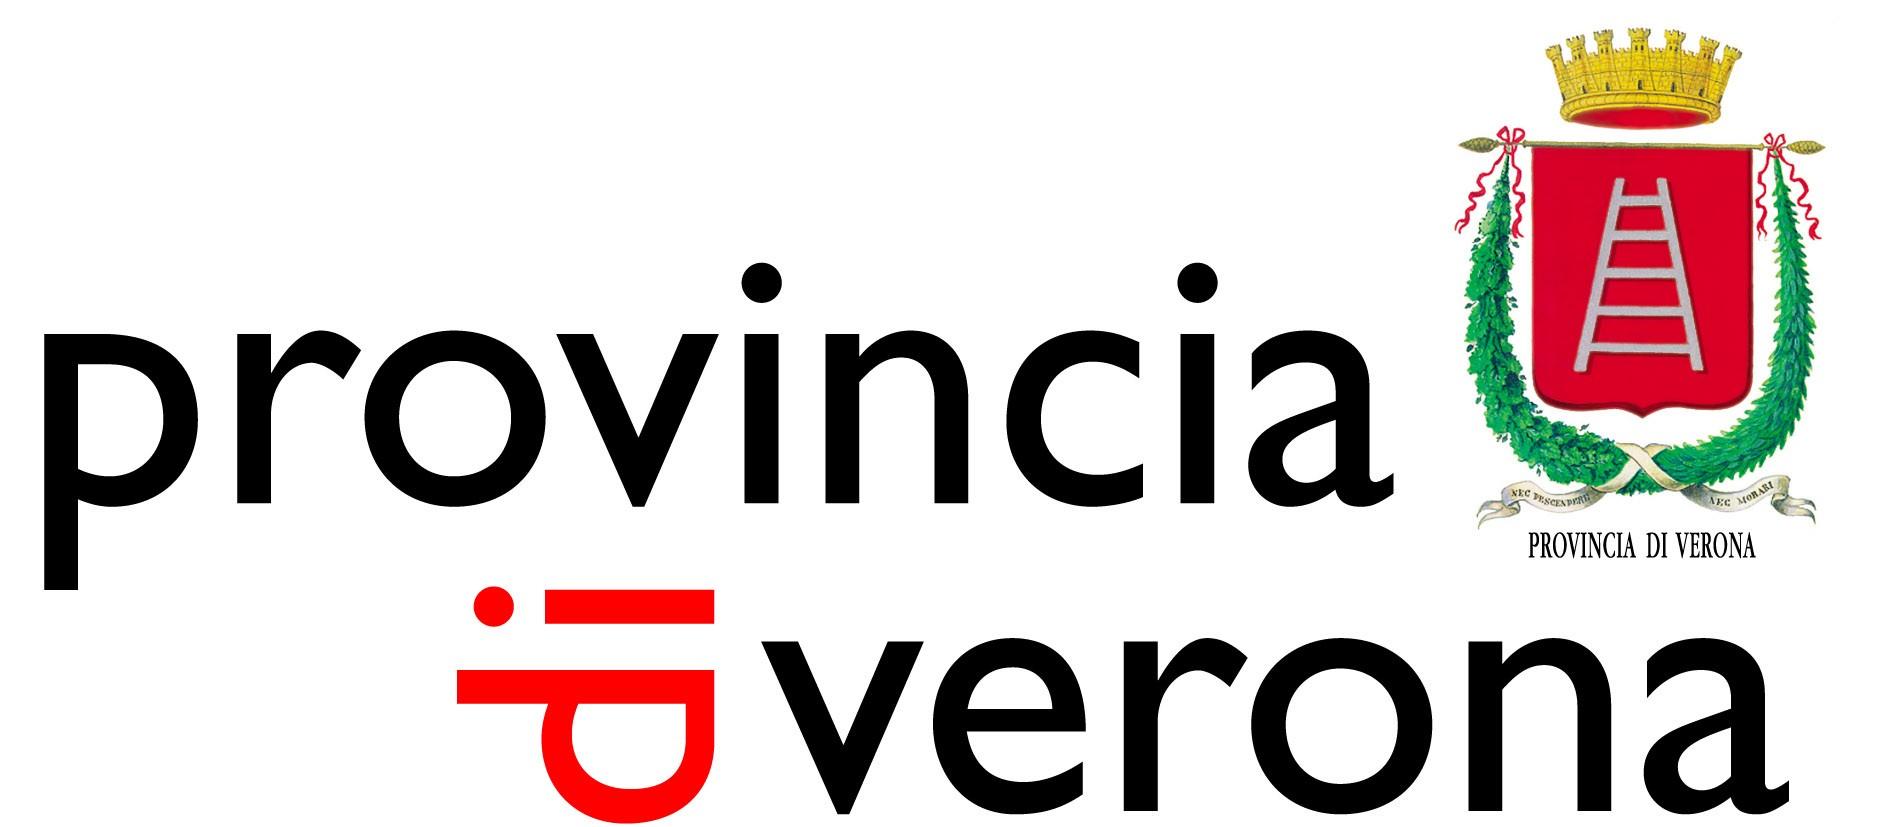 03 Provincia di Verona